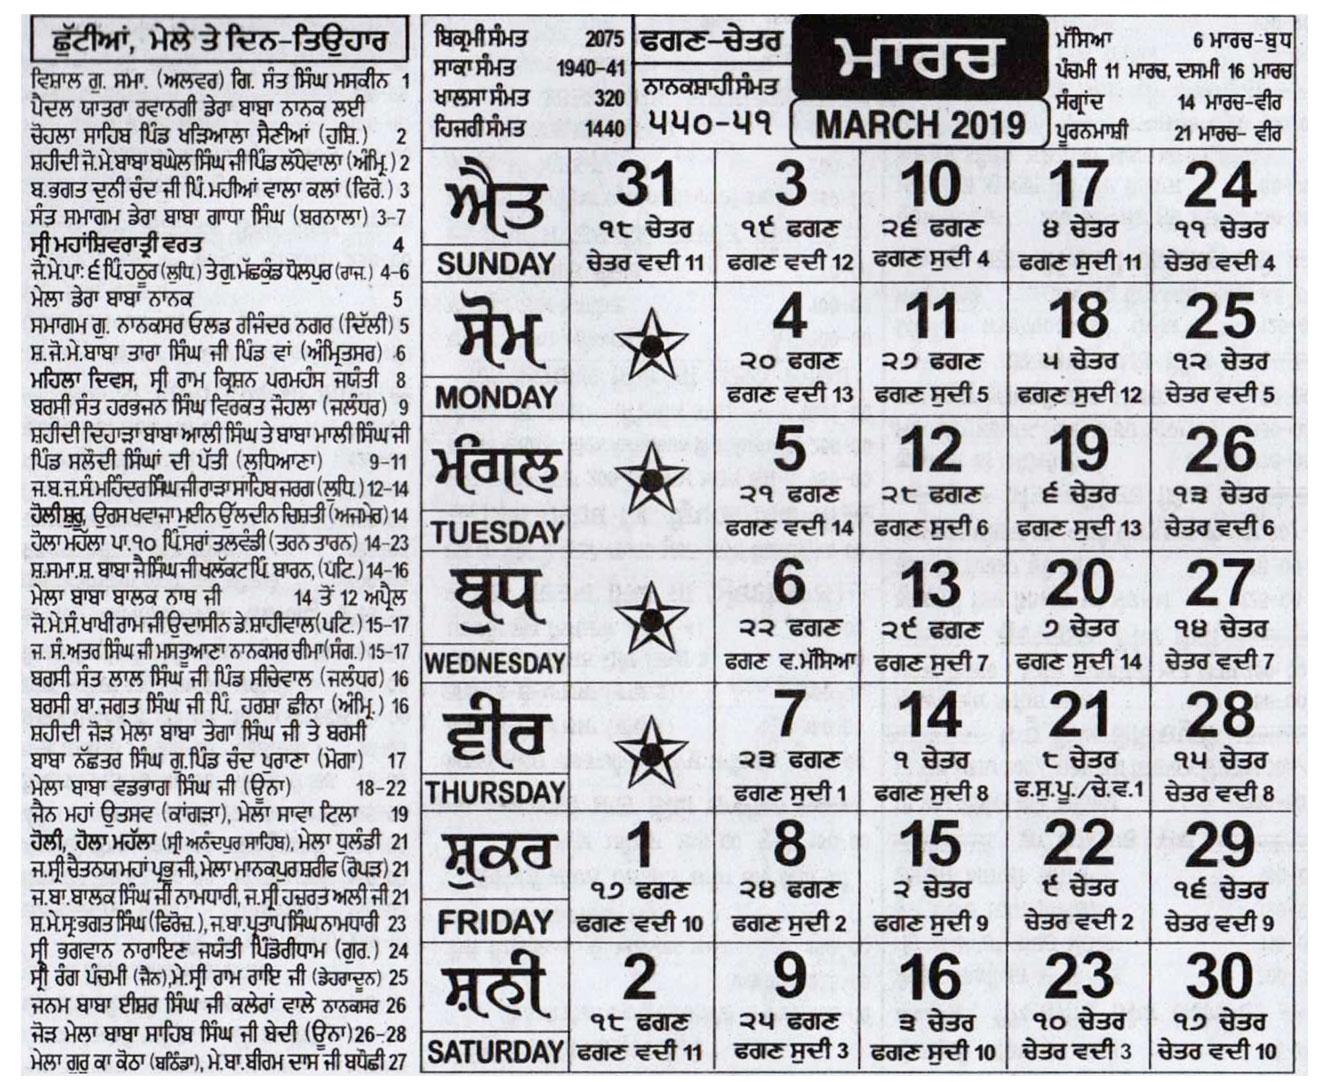 Khalsa Heera Jantri 2019  Nitnem Path with regard to Khalsa Heera Jantri 2020